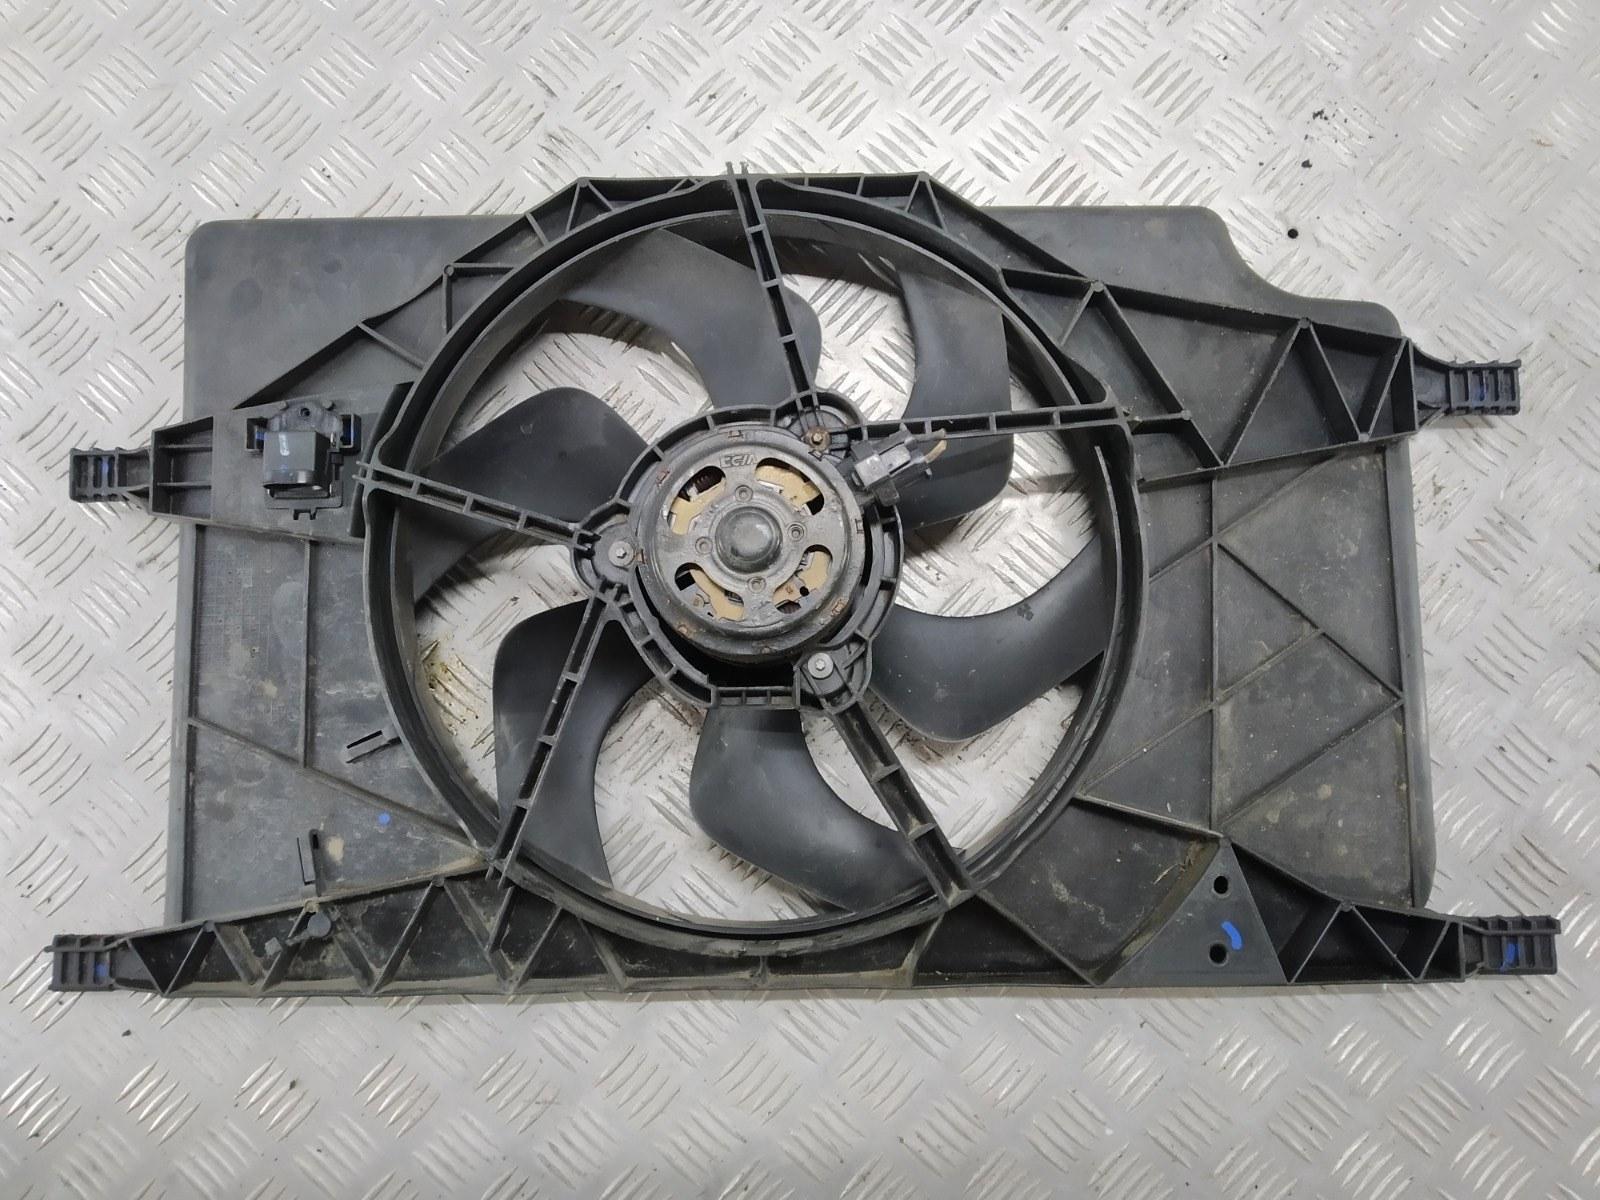 Вентилятор радиатора Renault Laguna 1.9 DCI 2007 (б/у)